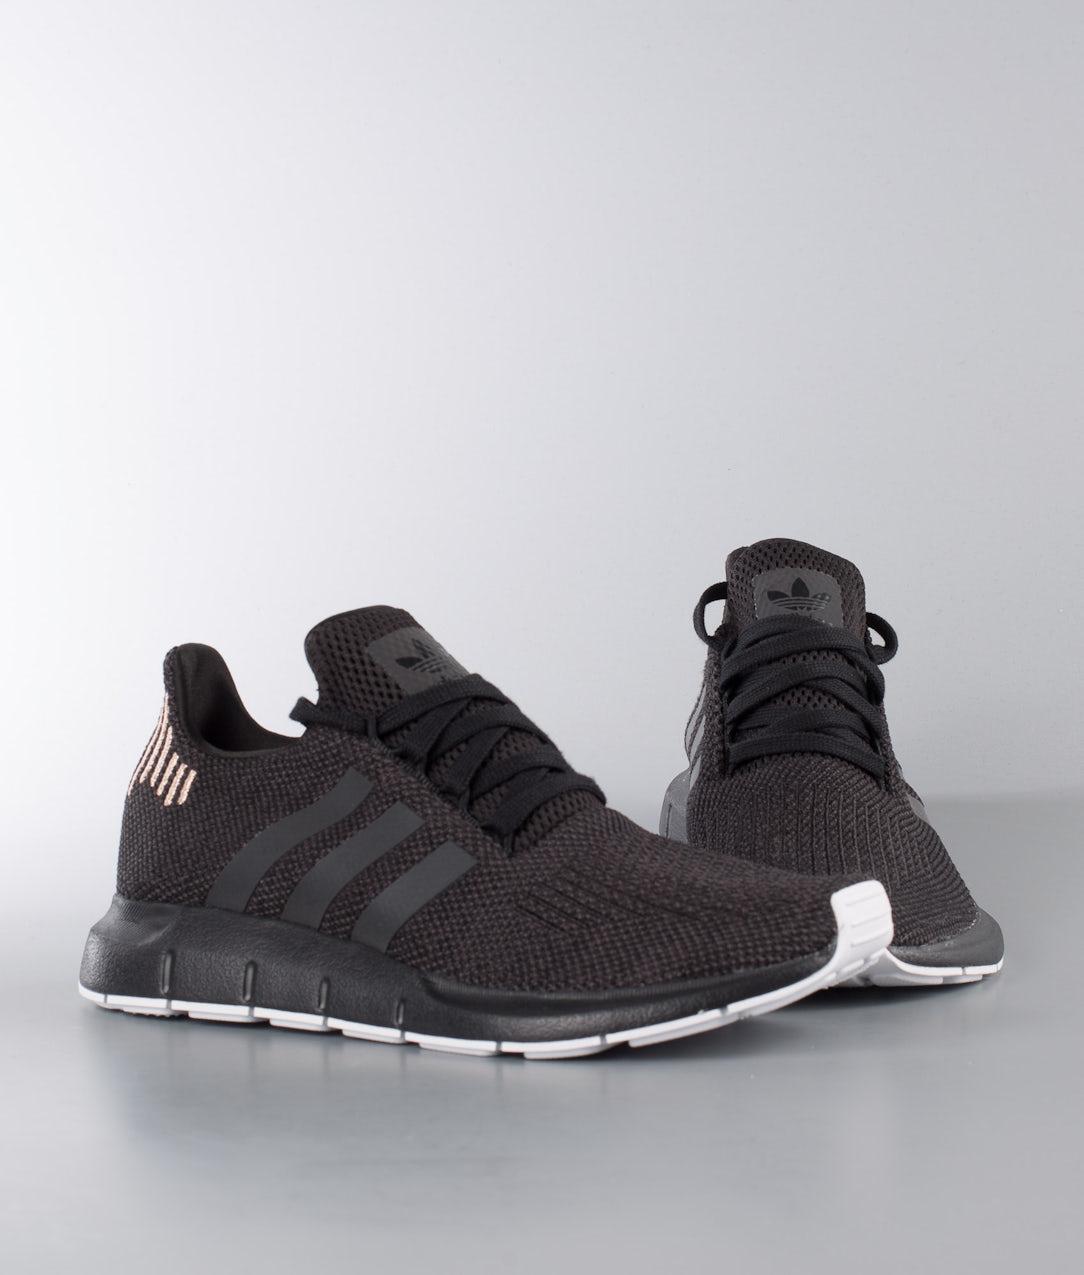 new product 9e545 5ea4d Adidas Originals Swift Run W Schuhe Core Black/Carbon/Ftwr White